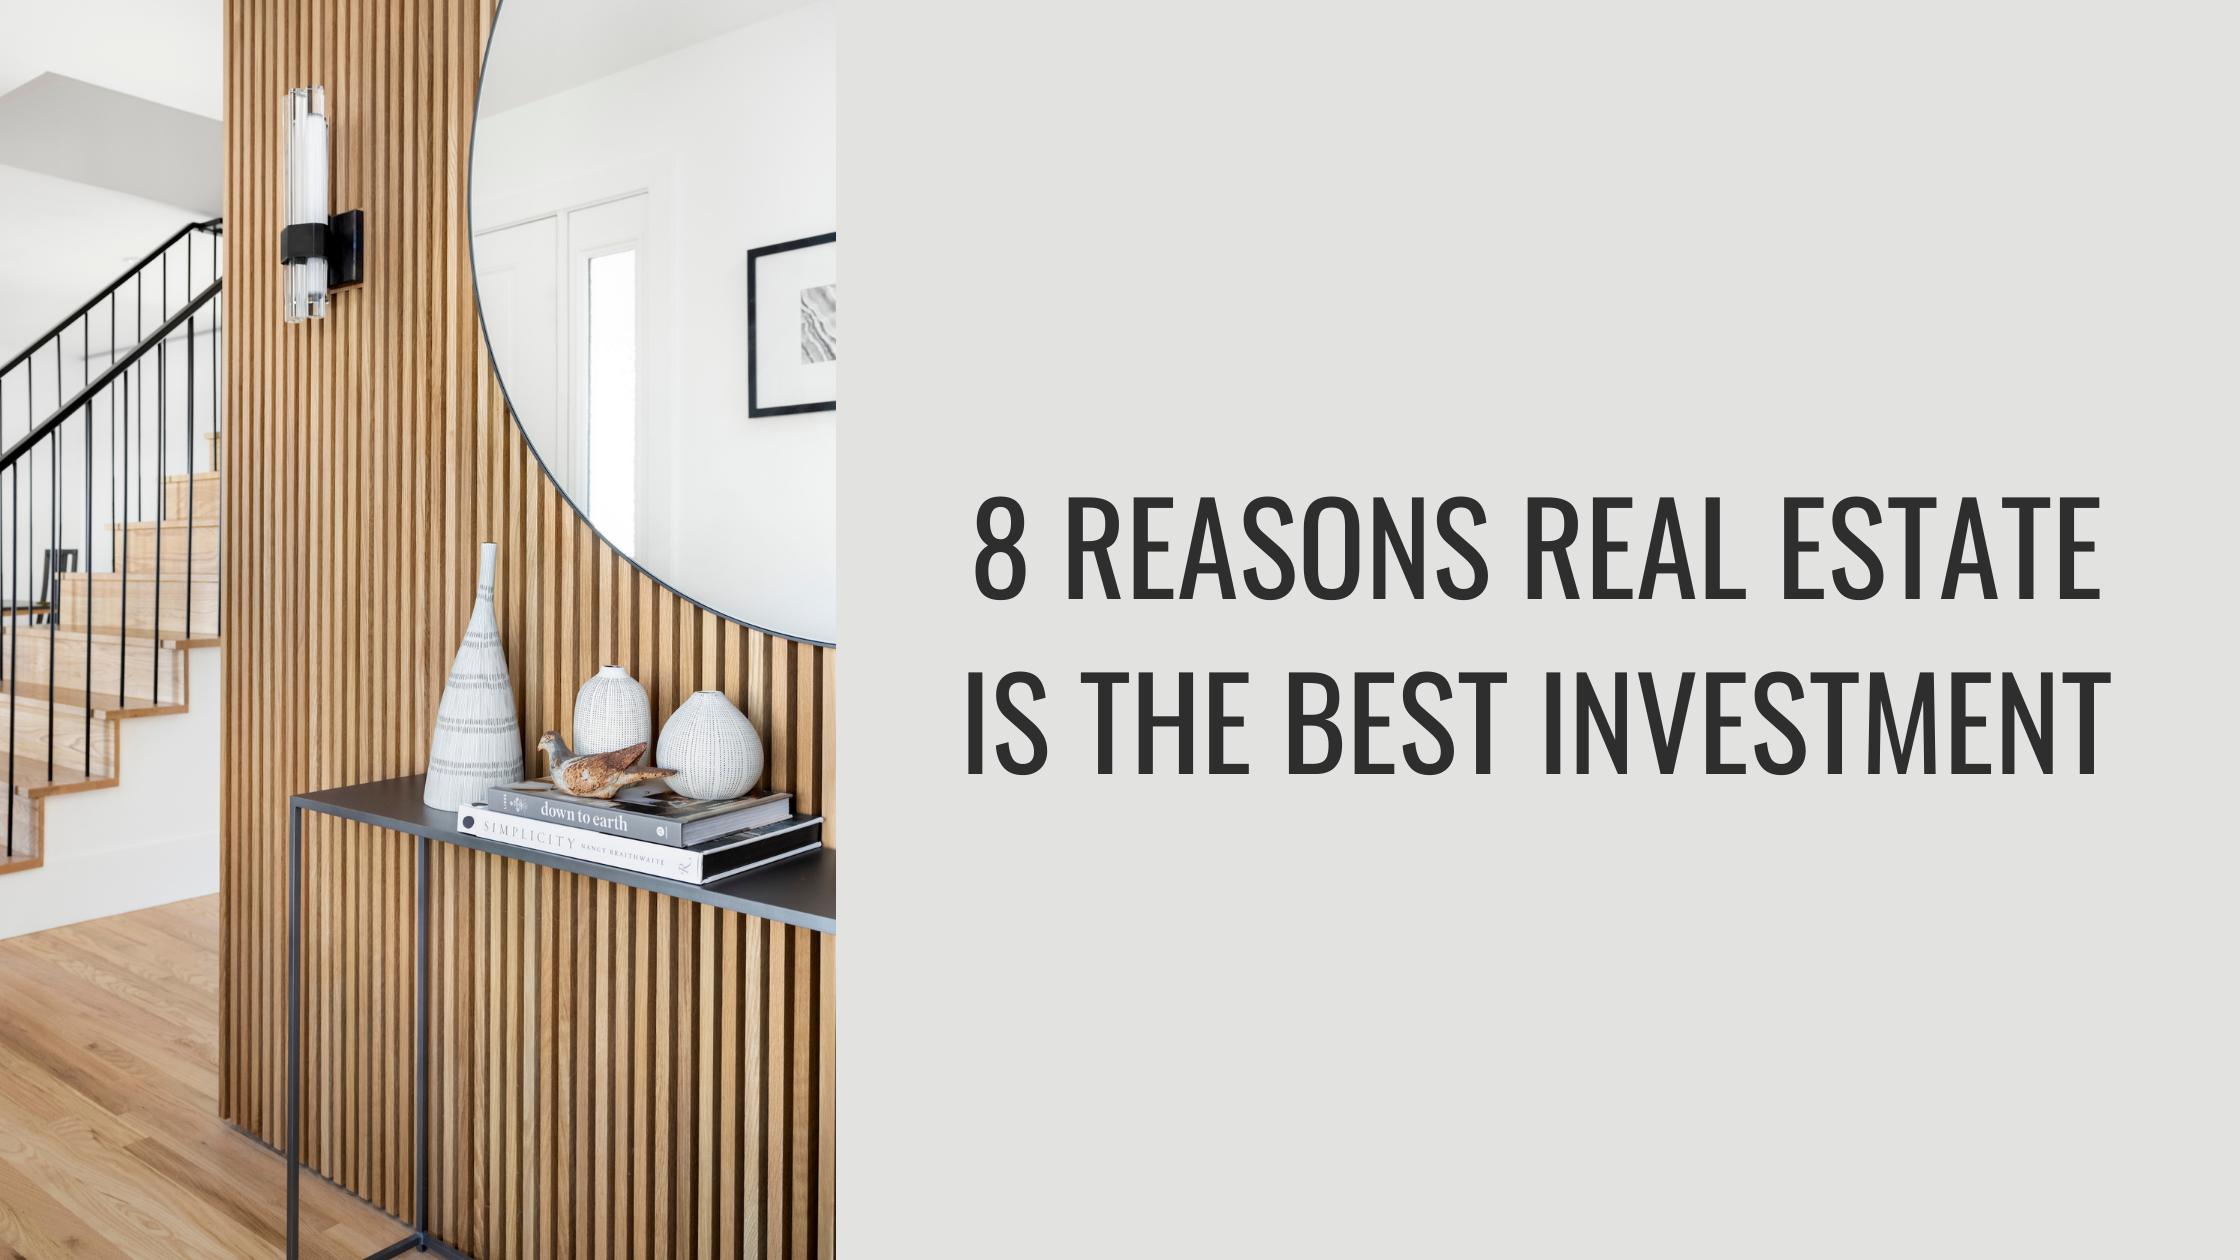 real estate investing, investing, real estate ottawa, ottawa realtors, best realtors in ottawa, ottawa realtors, Ottawa real estate agents